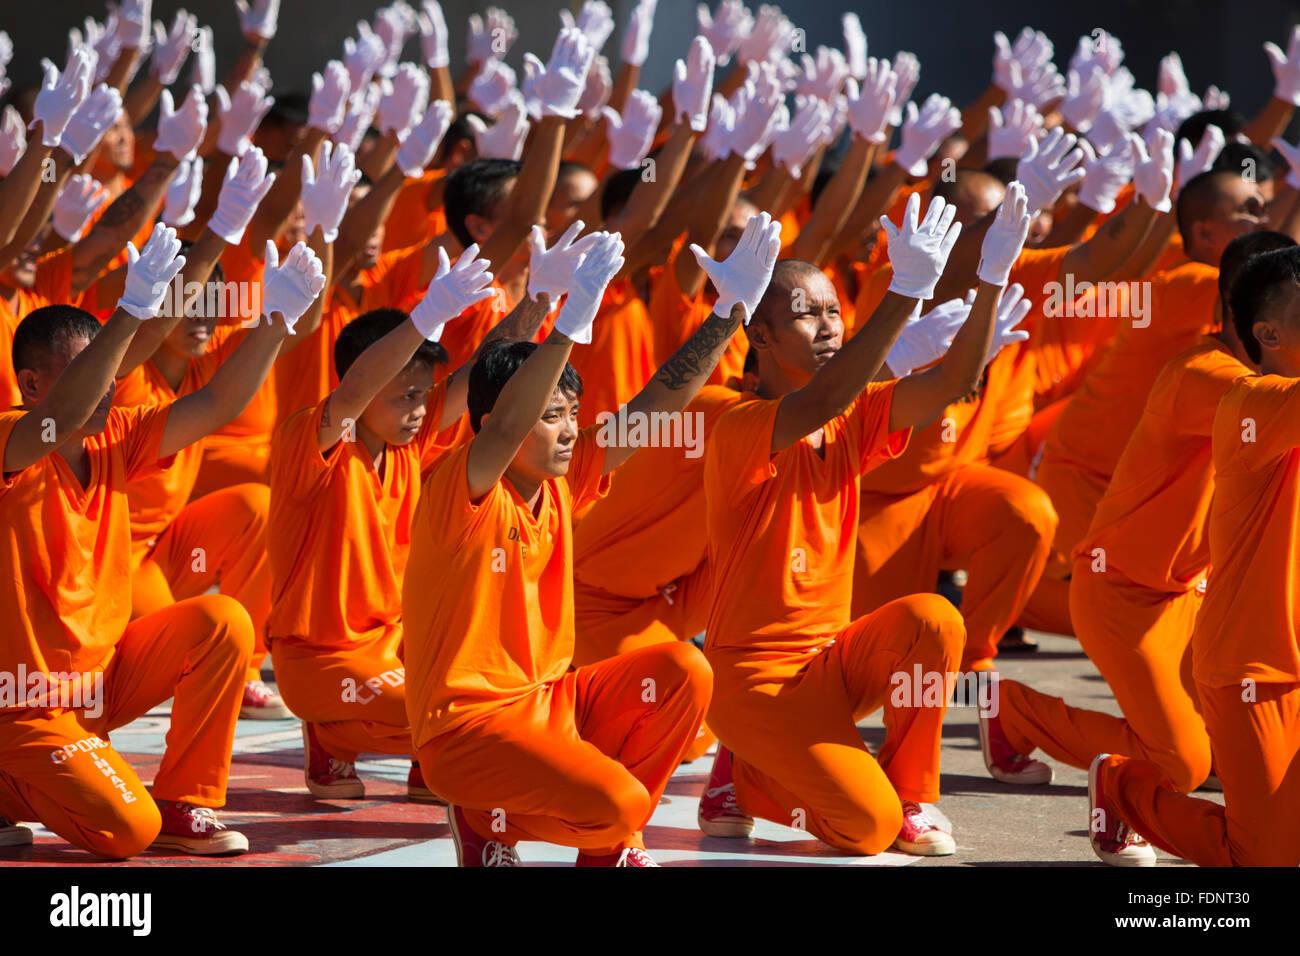 Tanzen Insassen des Cebu Provincial Detention and Rehabilitation Center, Cebu City, Philippinen Stockbild